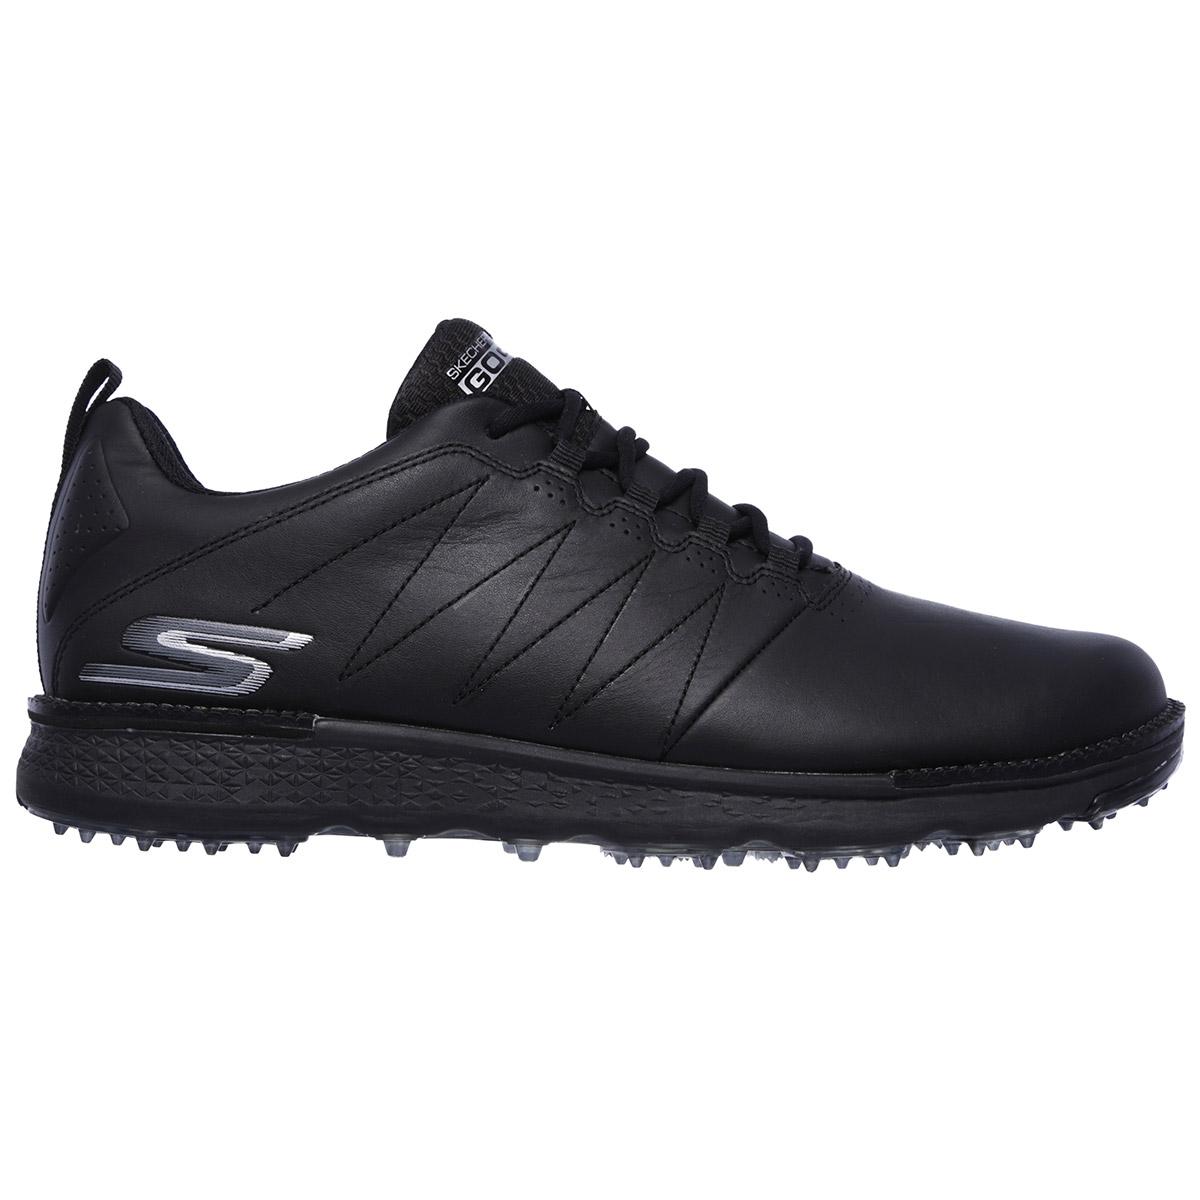 130b9e95cad0 Skechers Go Golf Elite V.3 Shoes from american golf